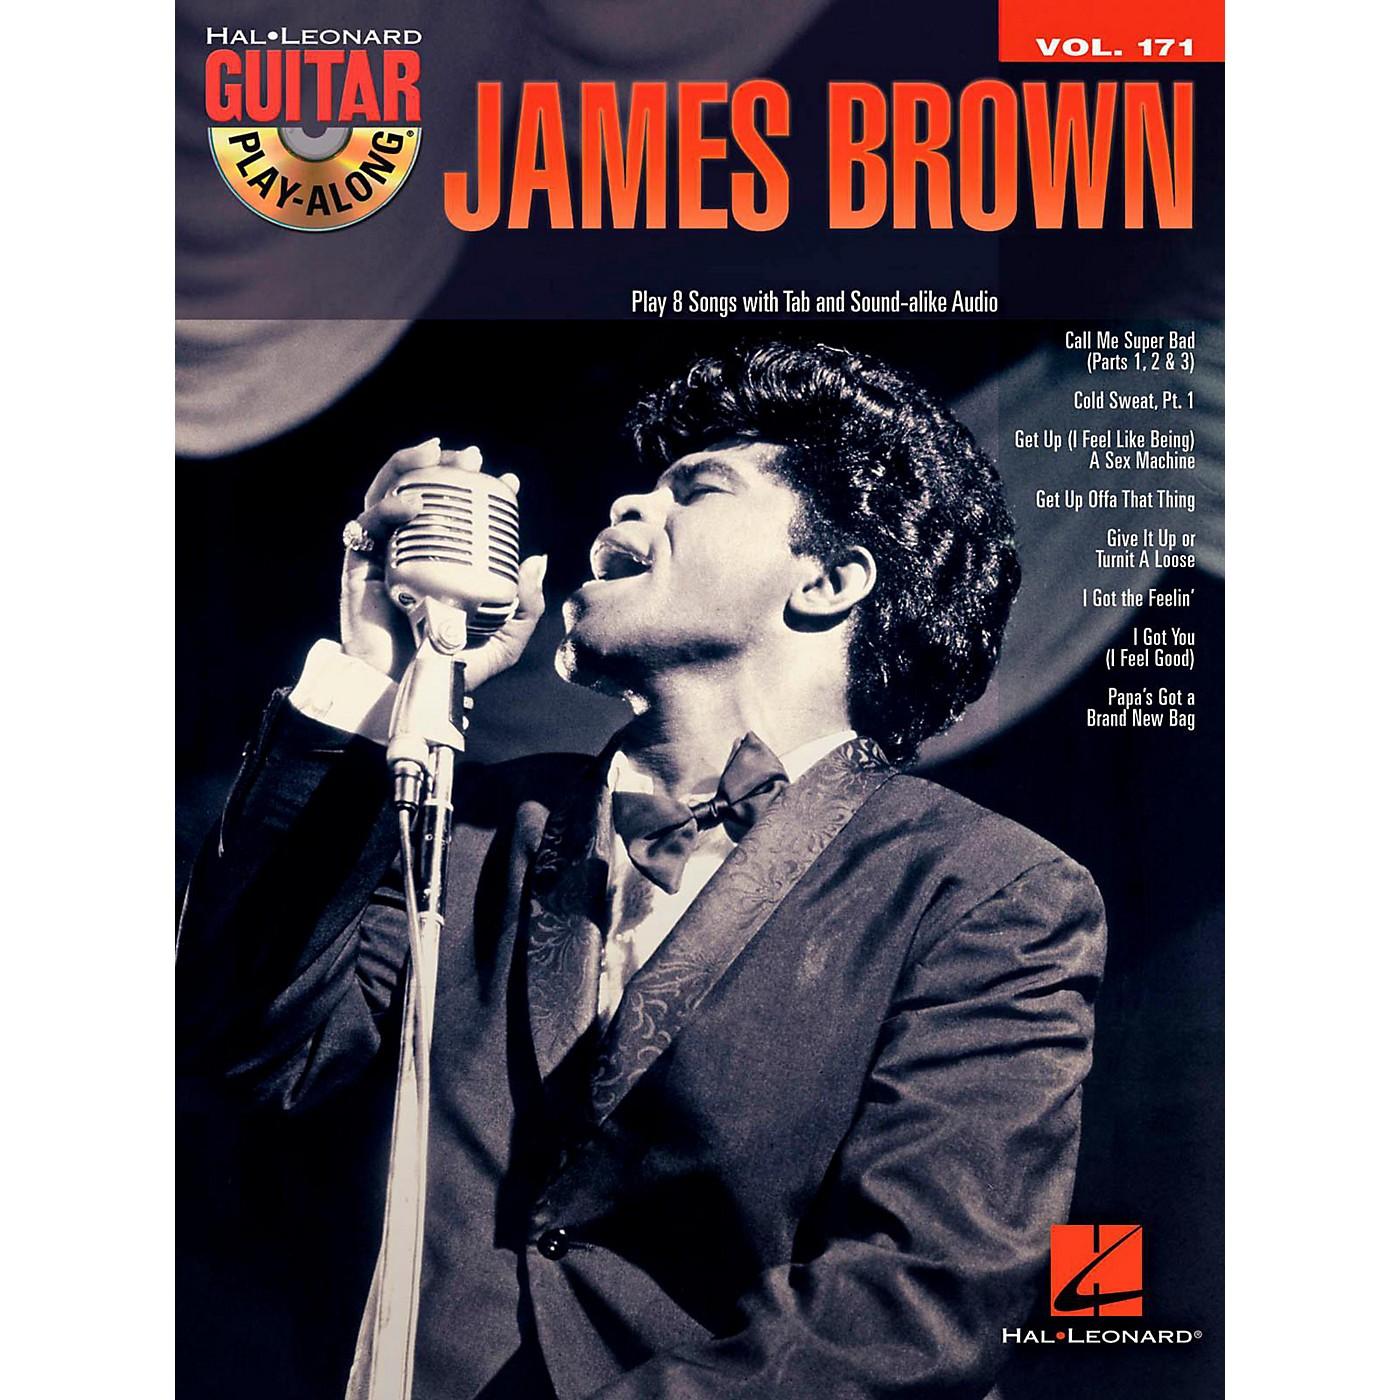 Hal Leonard James Brown - Guitar Play-Along Vol. 171 Book/CD thumbnail